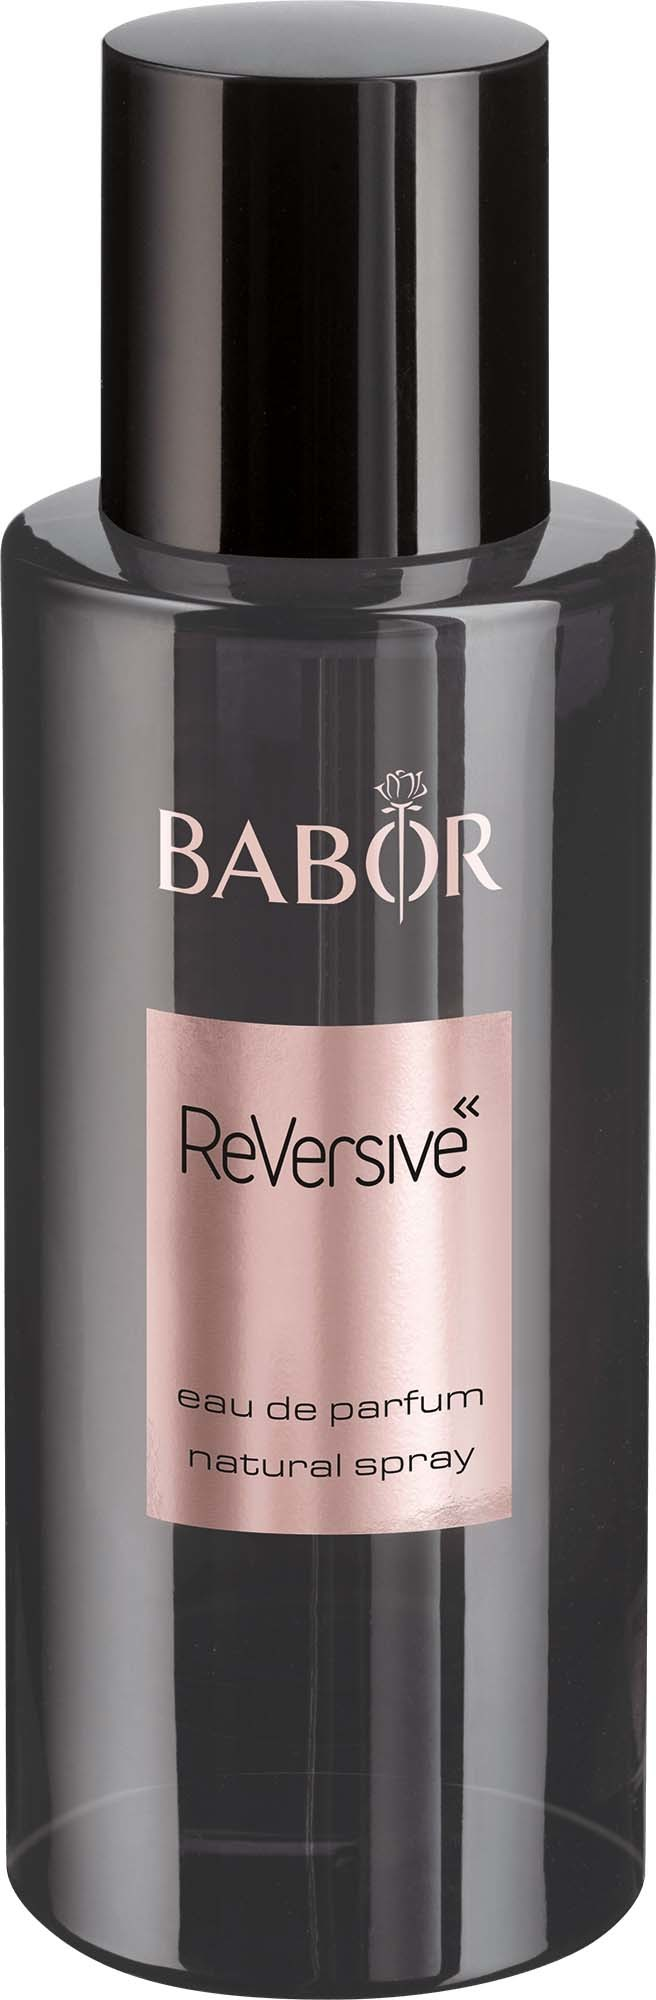 Парфюм Babor Reversive Eau De Parfum Natural Spray 50 мл